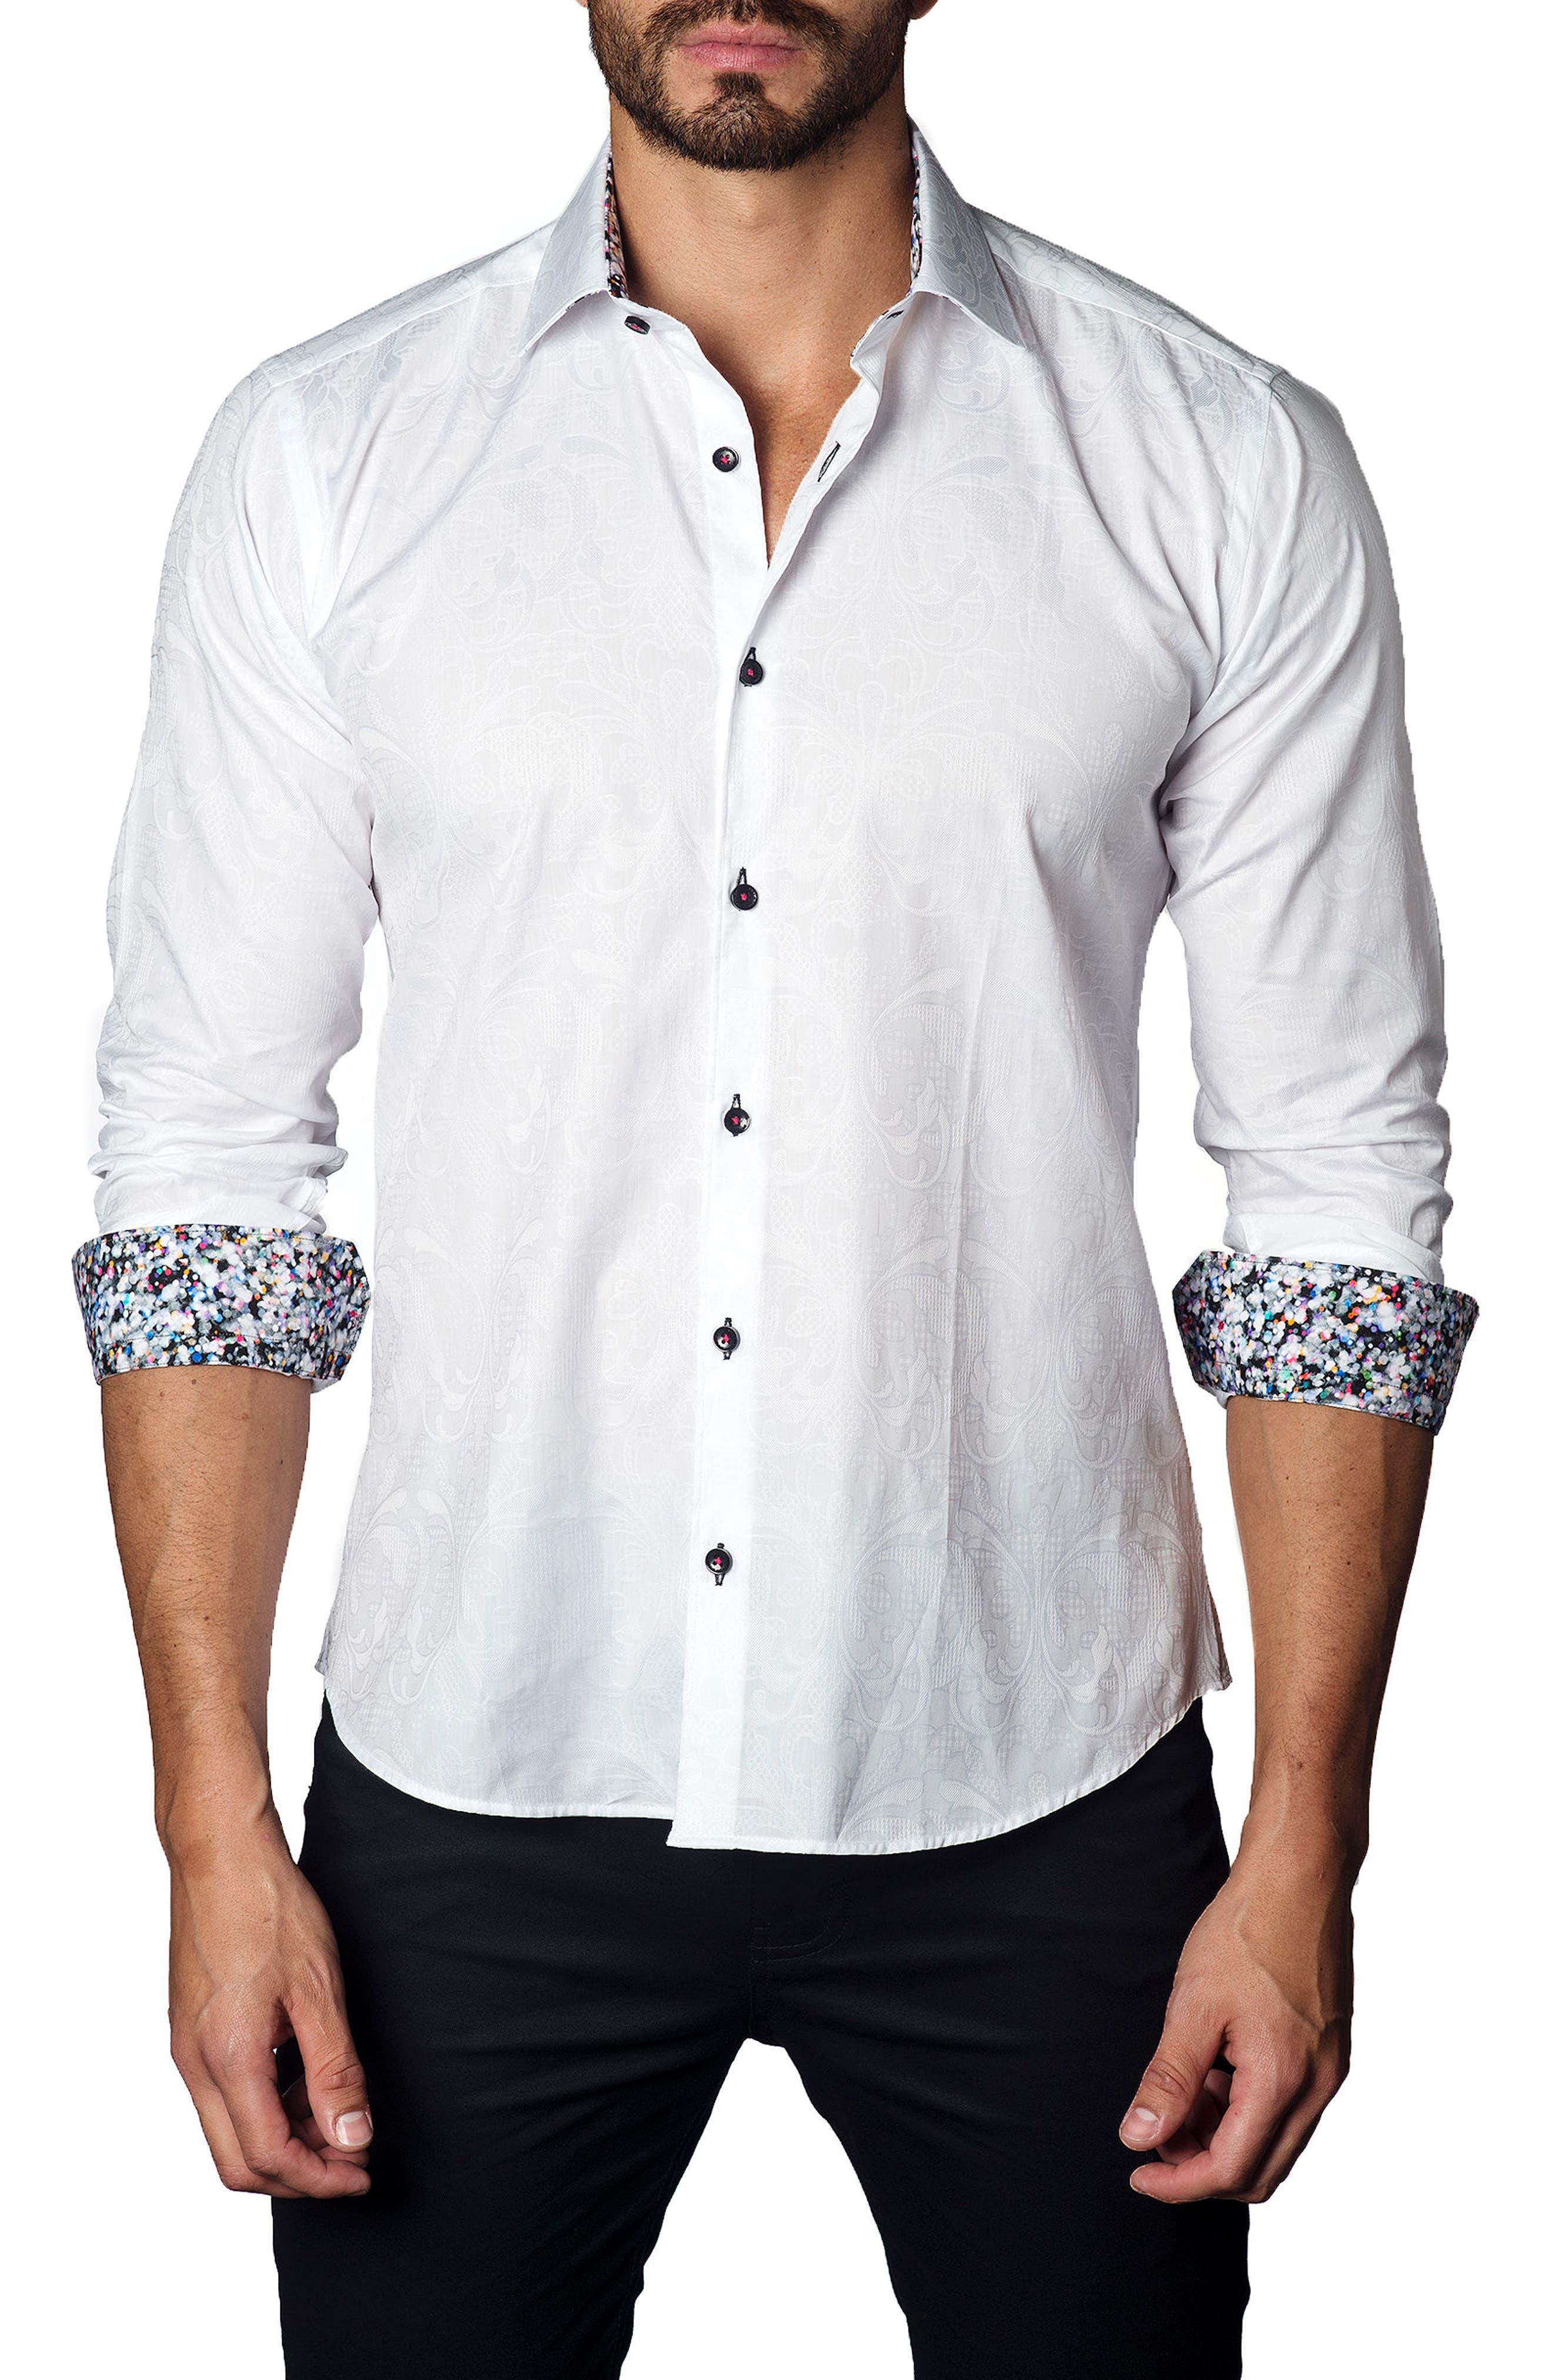 Alternate Image 1 Selected - Jared Lang Trim Fit Jacquard Sport Shirt